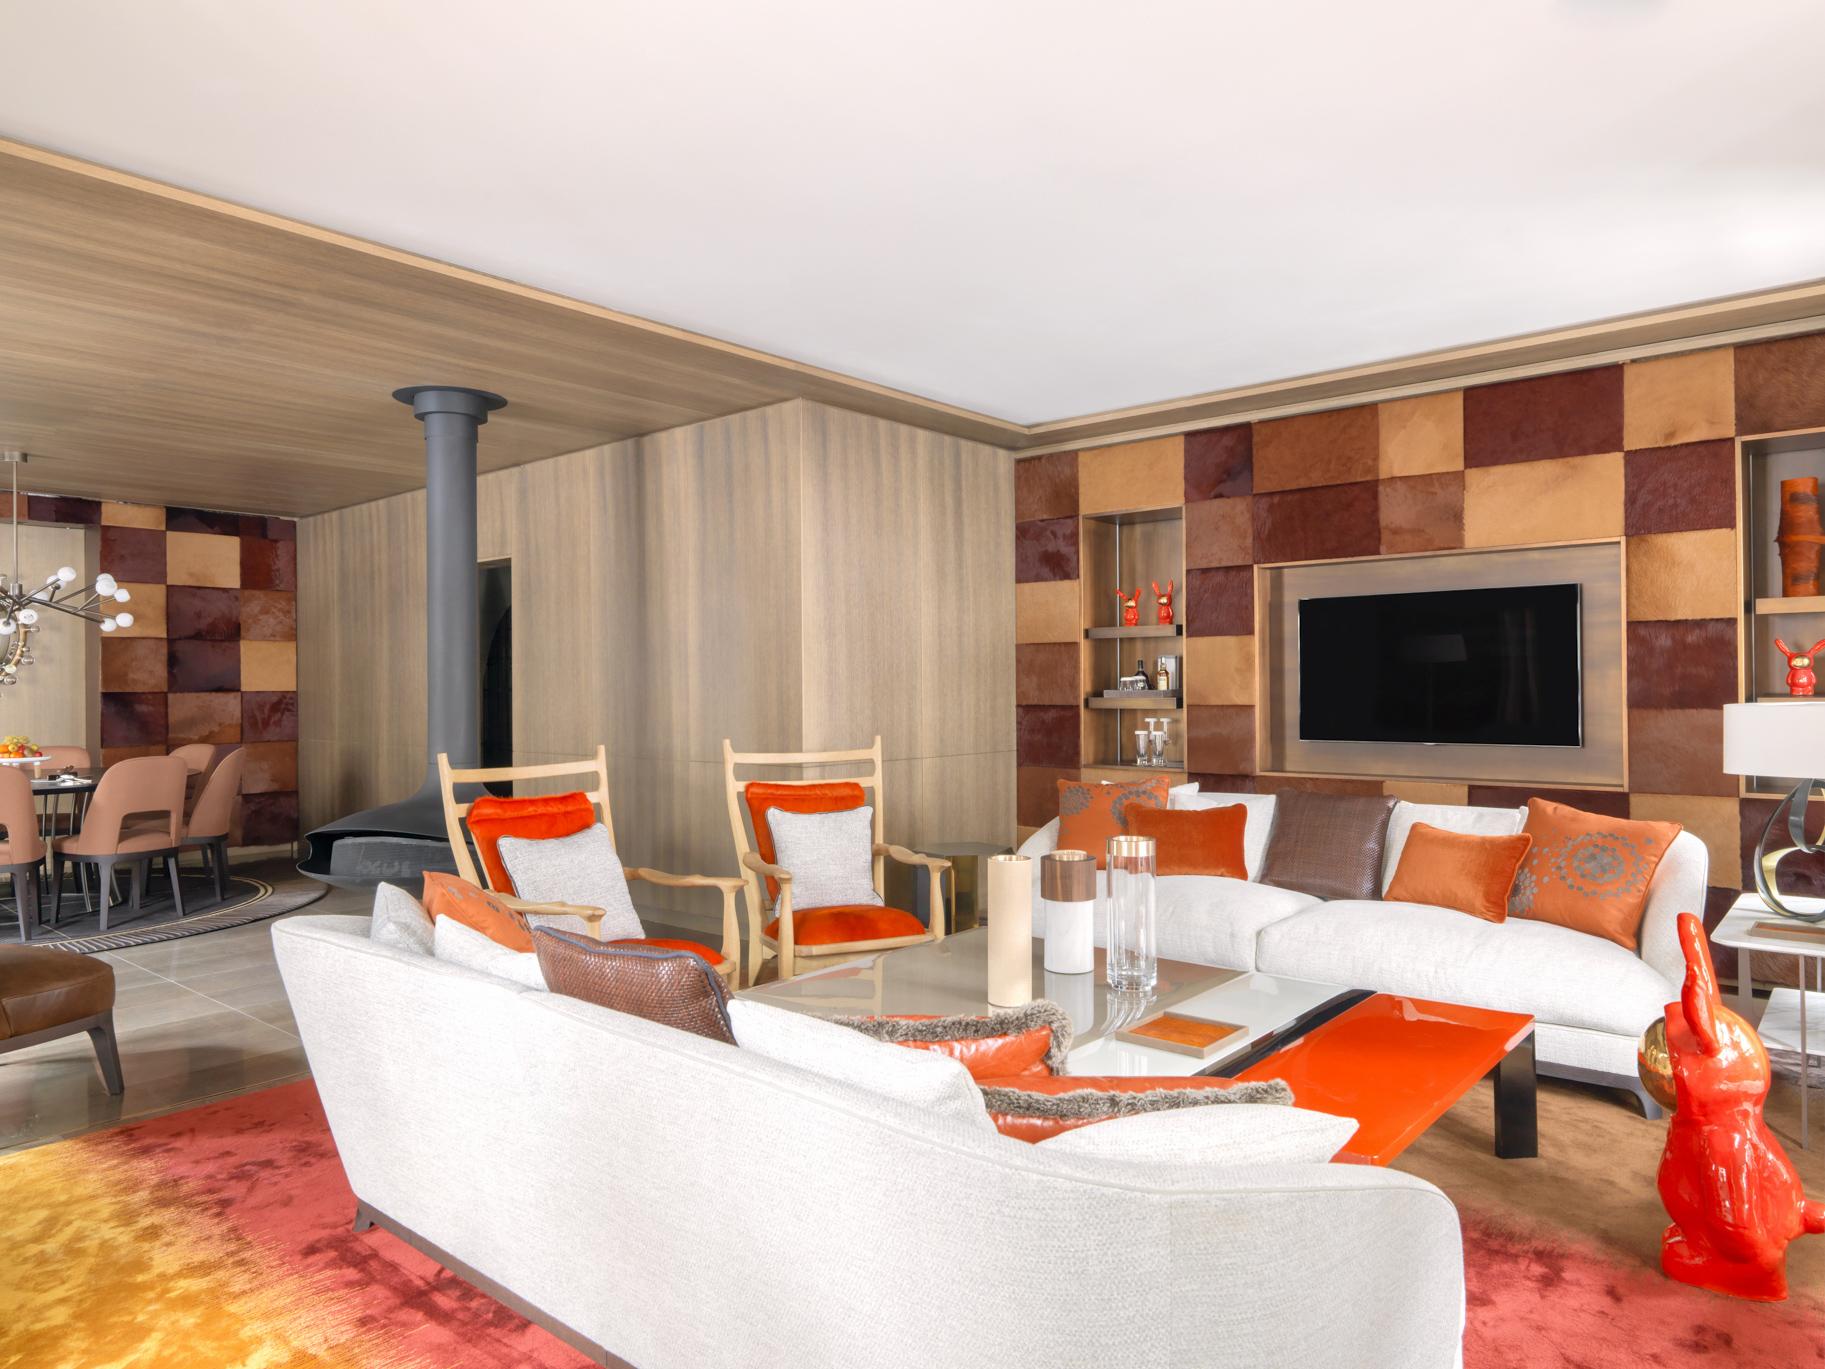 24-le-chalet-salon-le-chalet-living-room-s-julliard.jpg